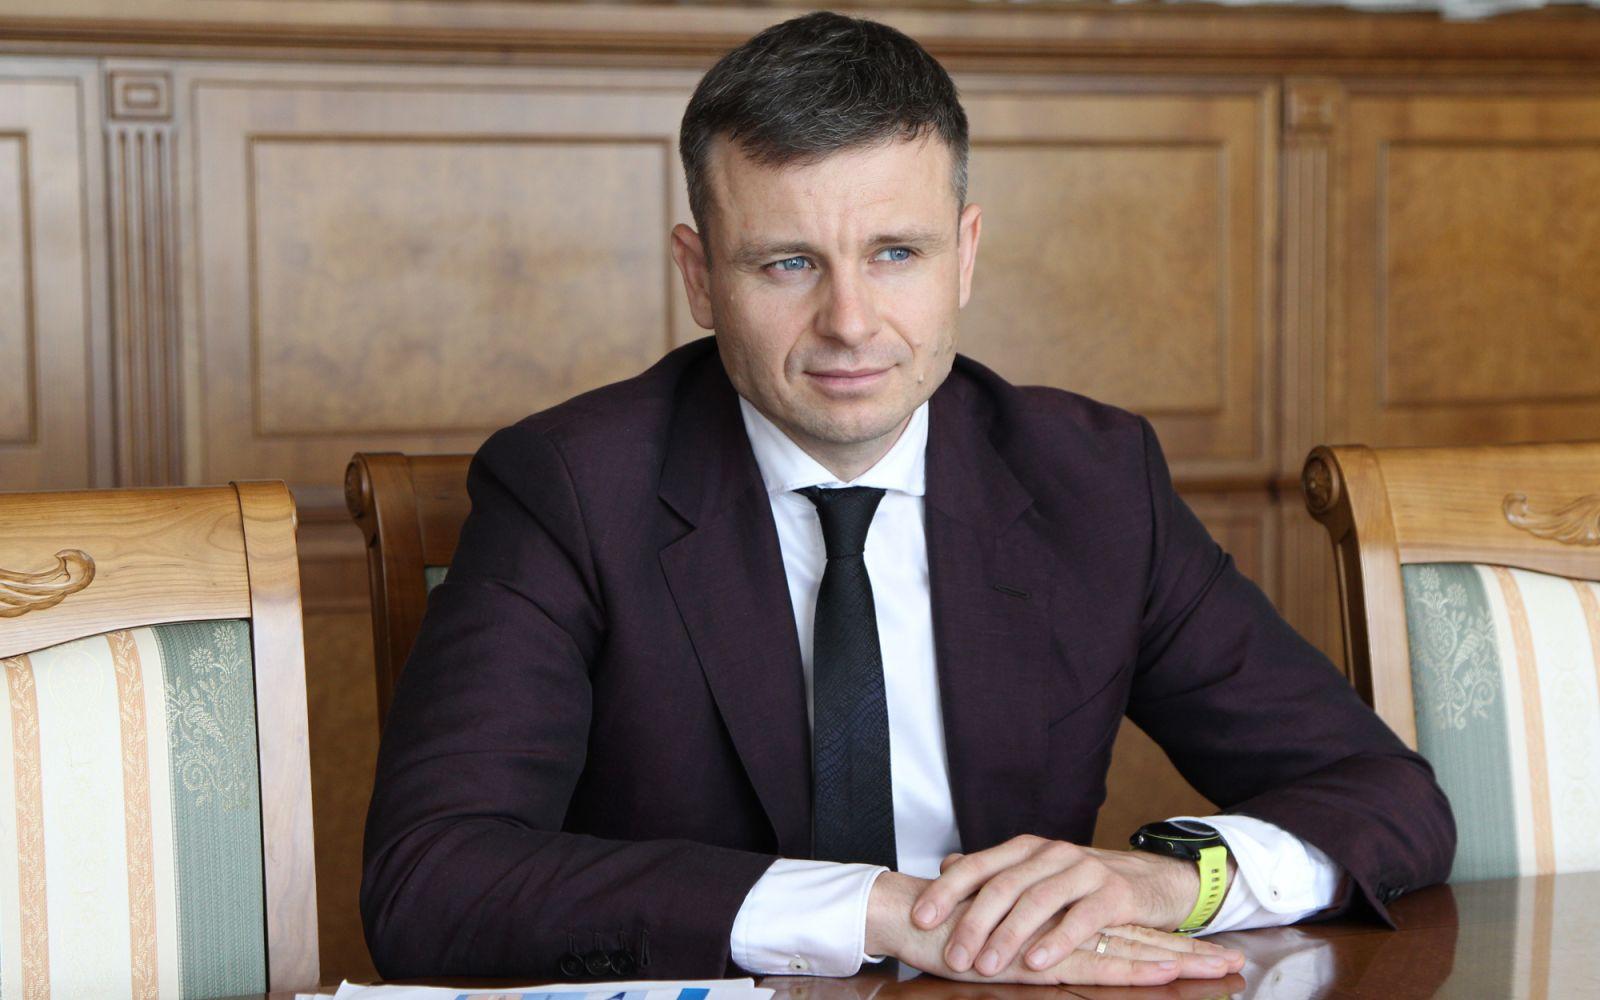 Страж доверия. Глава Минфина Марченко — о госдолге, отношениях с МВФ и о...